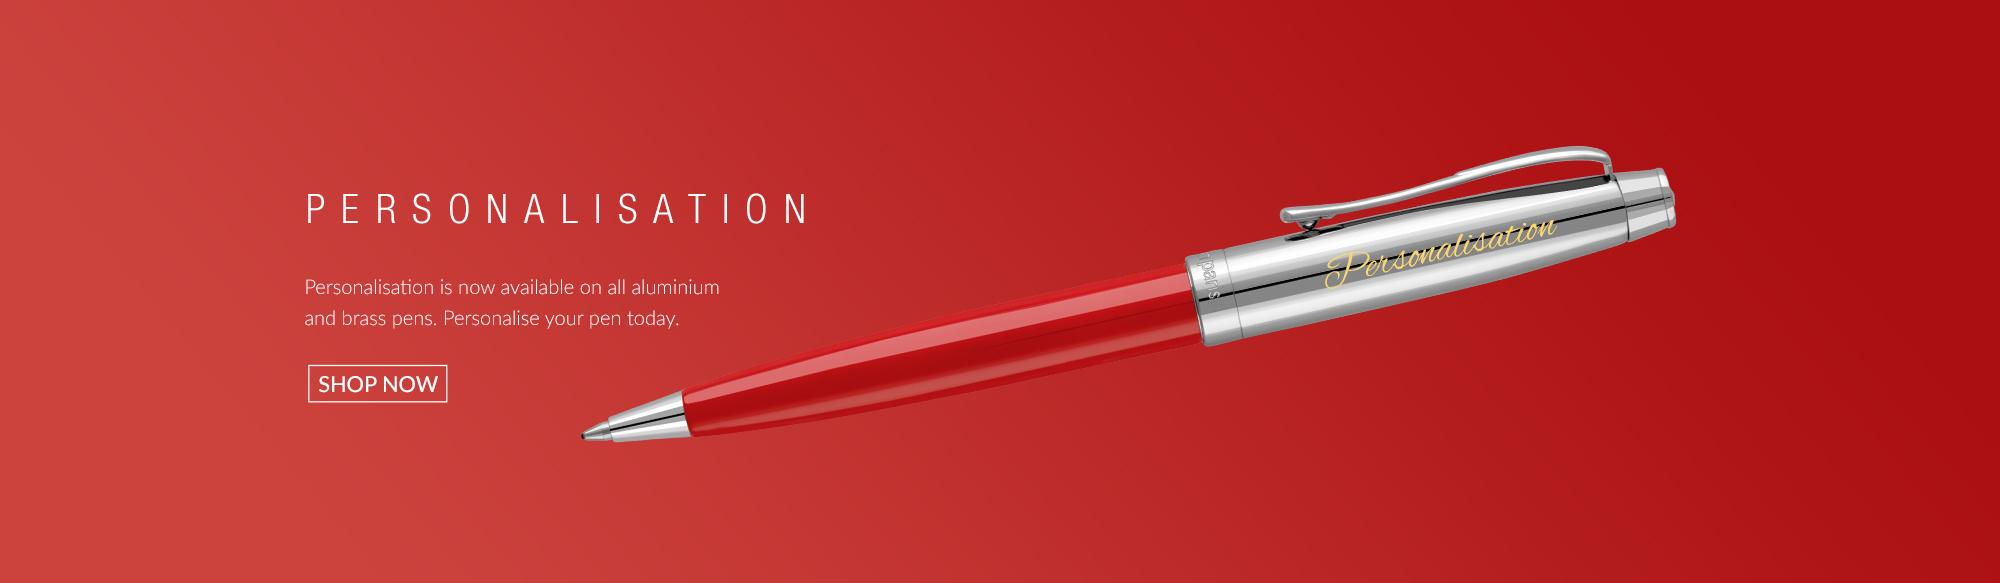 Designer personalisation from Pierre Cardin